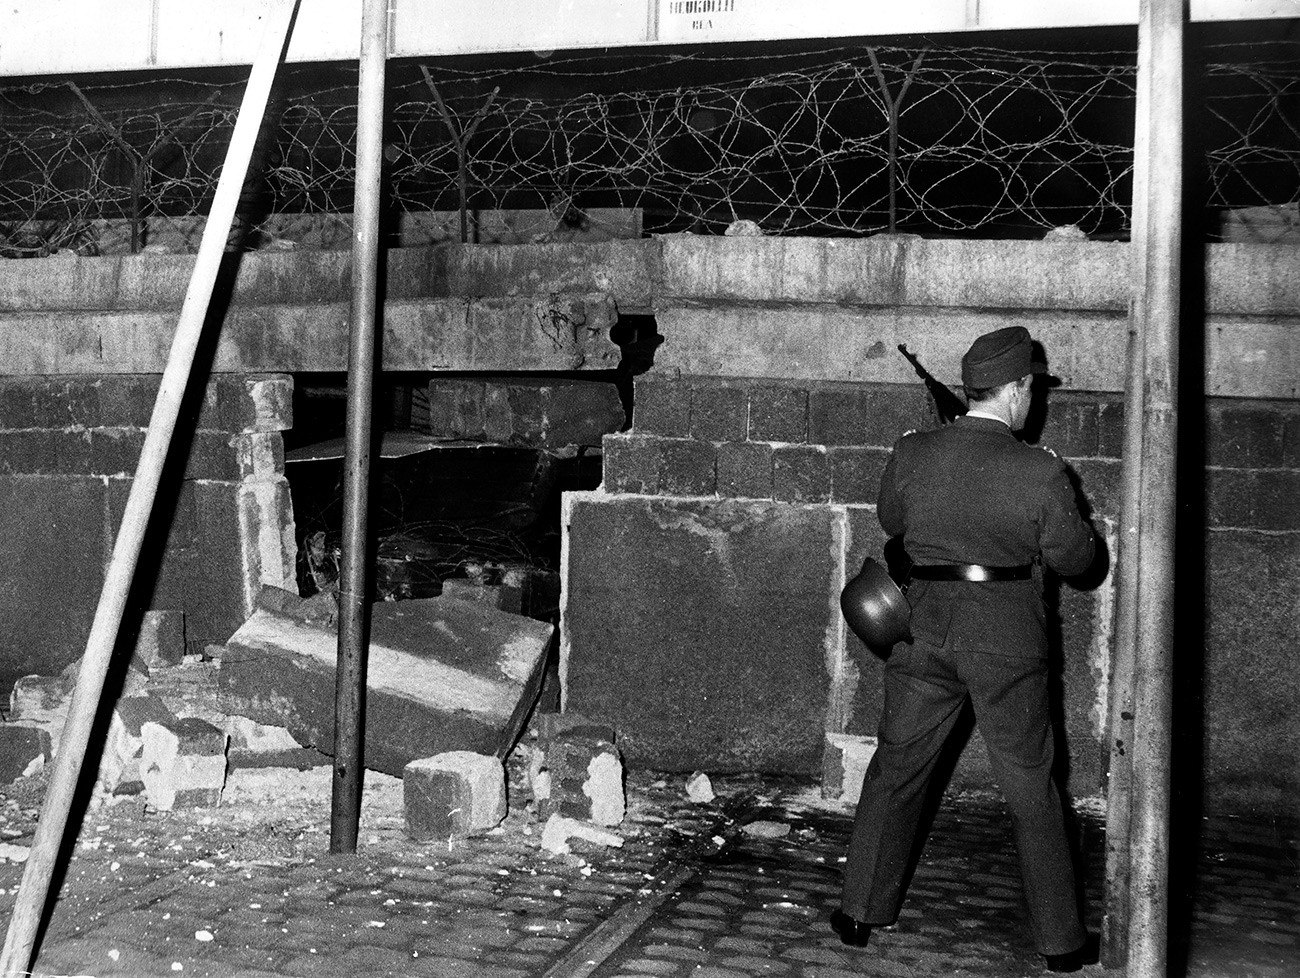 Polisi Jerman Timur menjaga tembok yang hancur ditabrak mobil pengangkut personel lapis baja yang dikendarai Wolfgang Engels dalam upaya pelarian dirinya ke Barat.